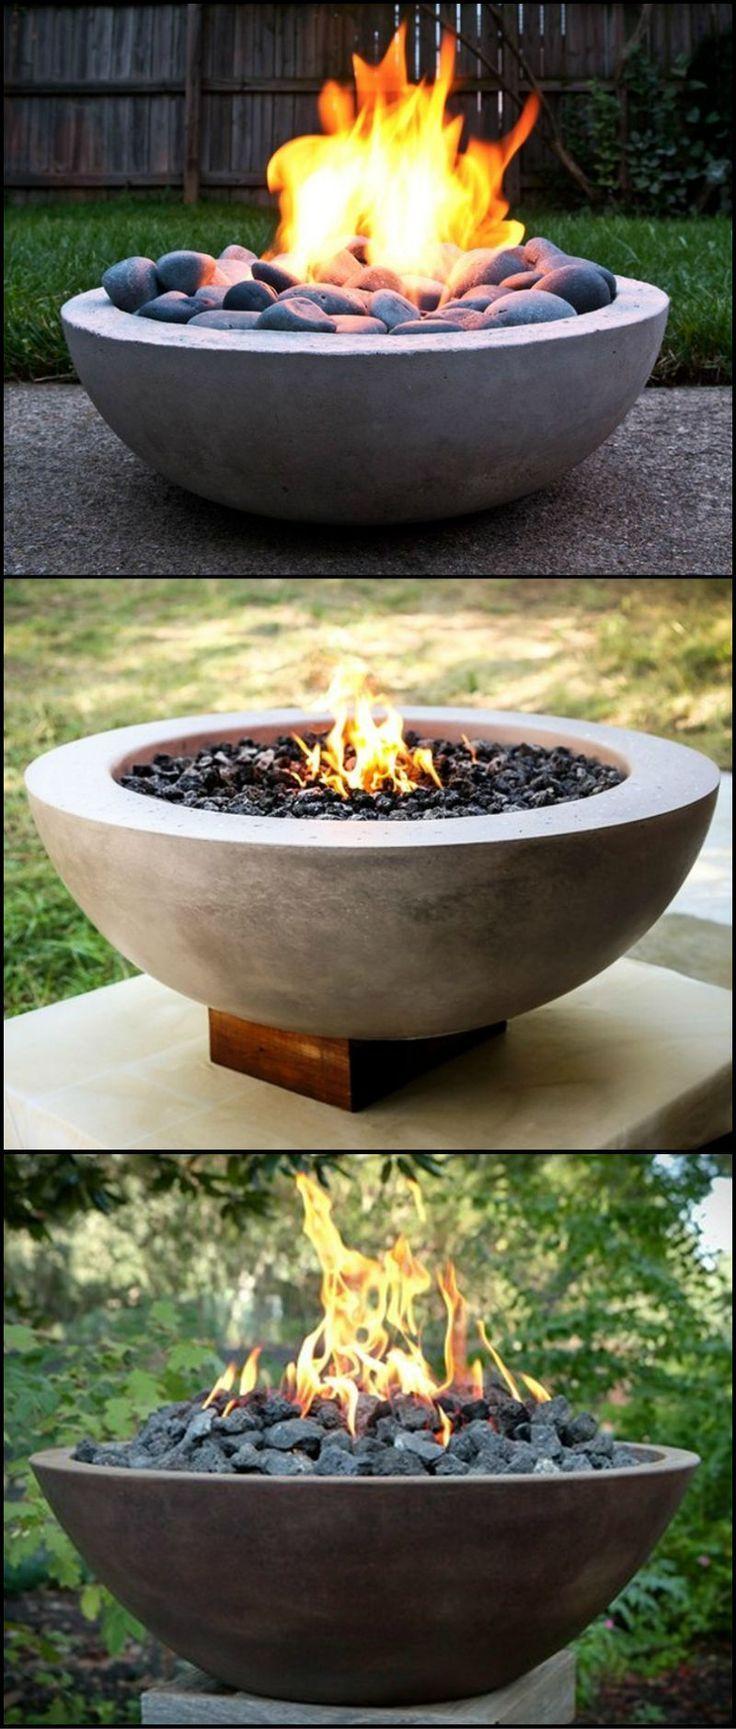 17 best ideas about concrete fire pits on pinterest diy. Black Bedroom Furniture Sets. Home Design Ideas